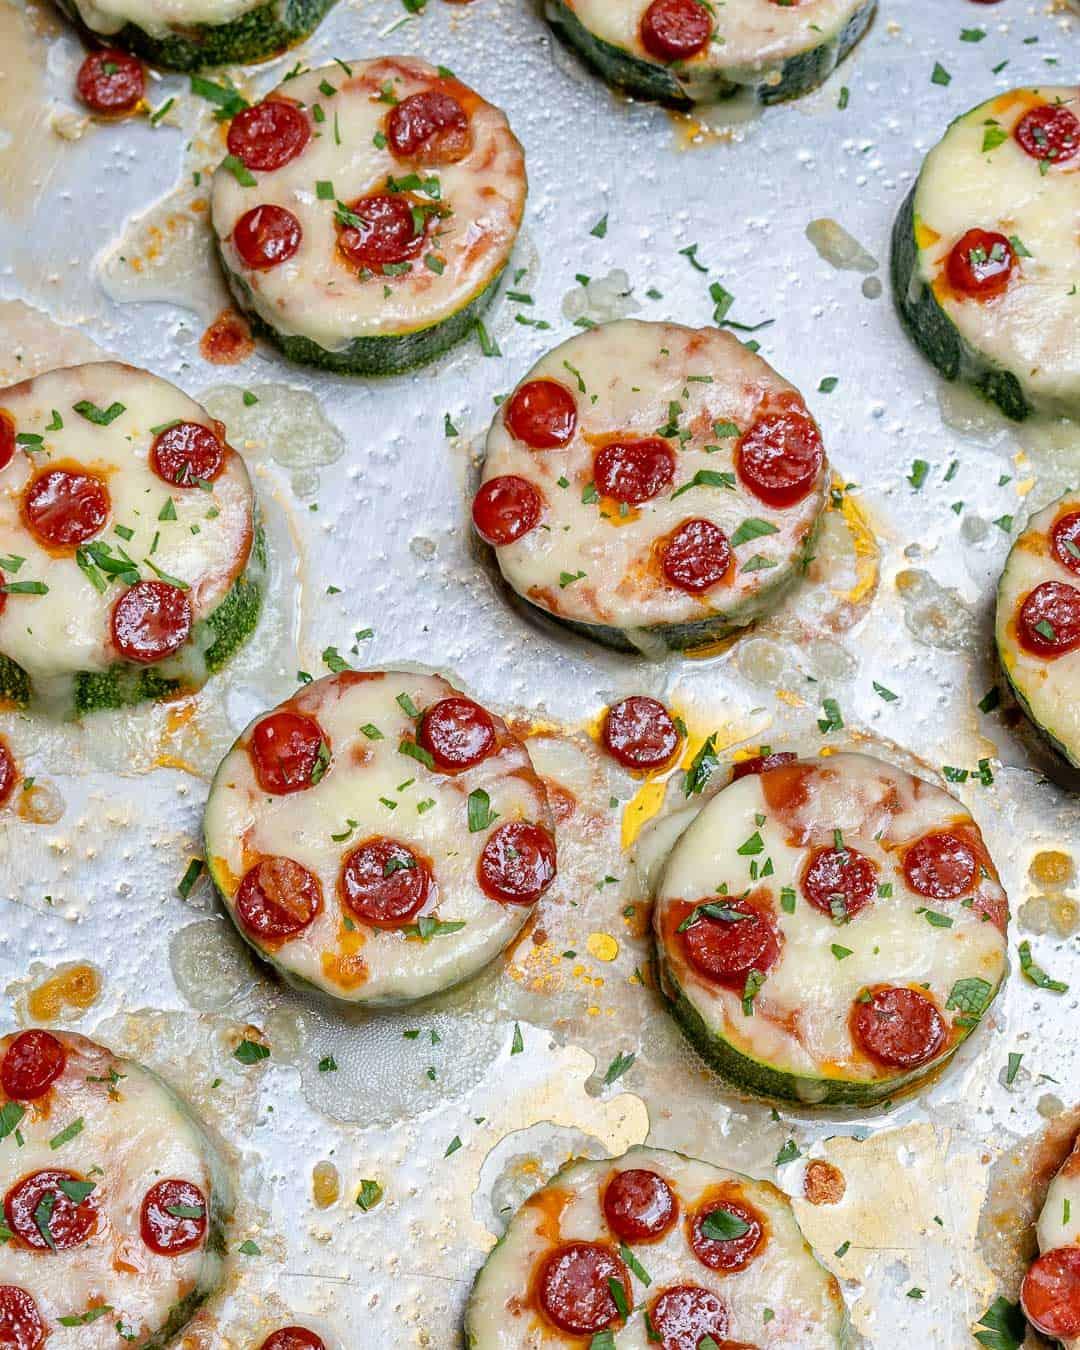 Zucchini pizza bites on a tray